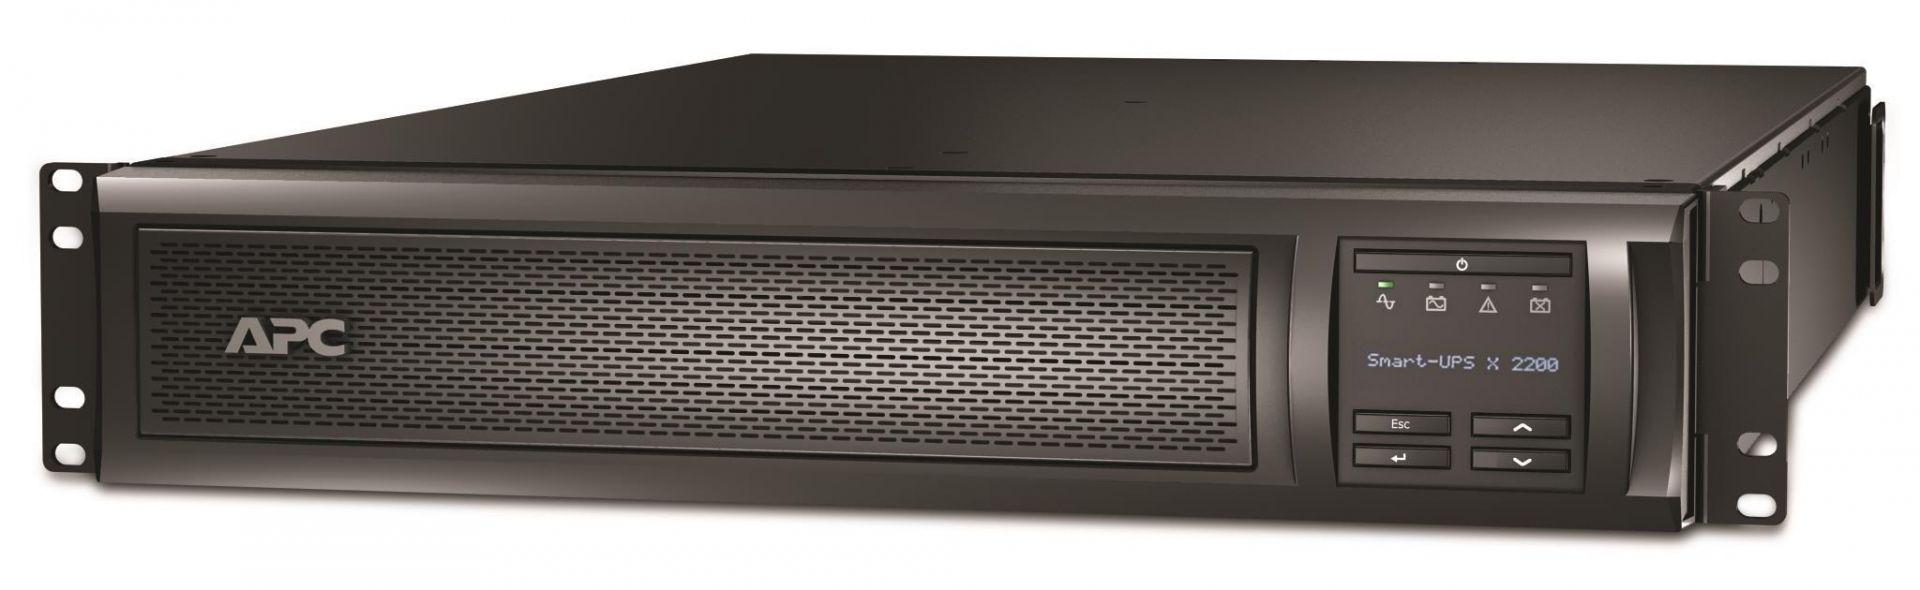 APC Smart-UPS X 2200VA Rack/Tower LCD 200-240V (SMX2200RMHV2U)